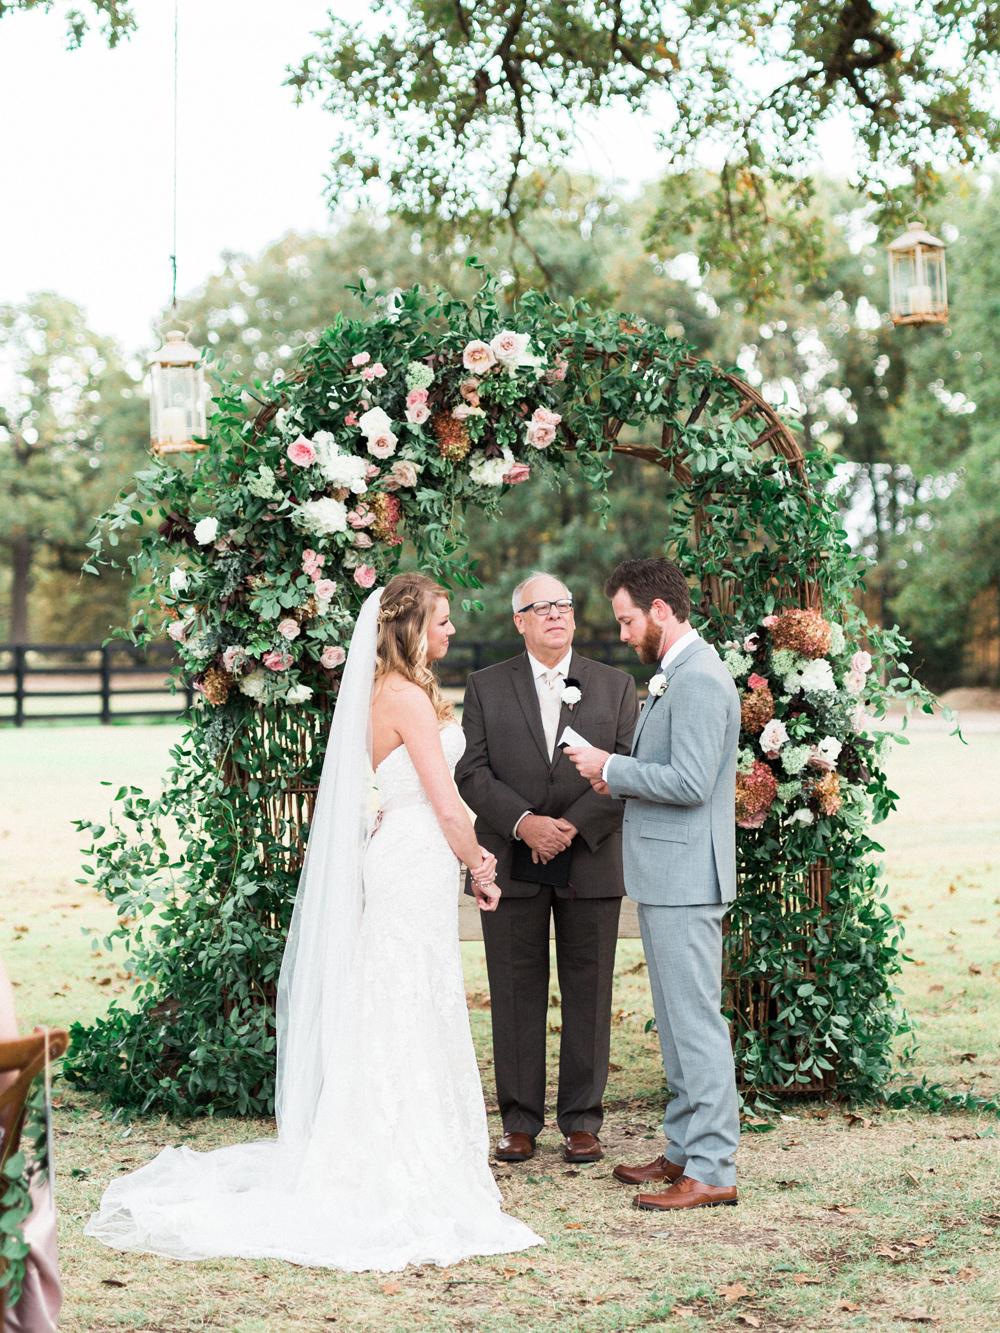 wedding ceremonies - photo by Elisabeth Carol Photography http://ruffledblog.com/picturesque-garden-wedding-at-white-sparrow-barn